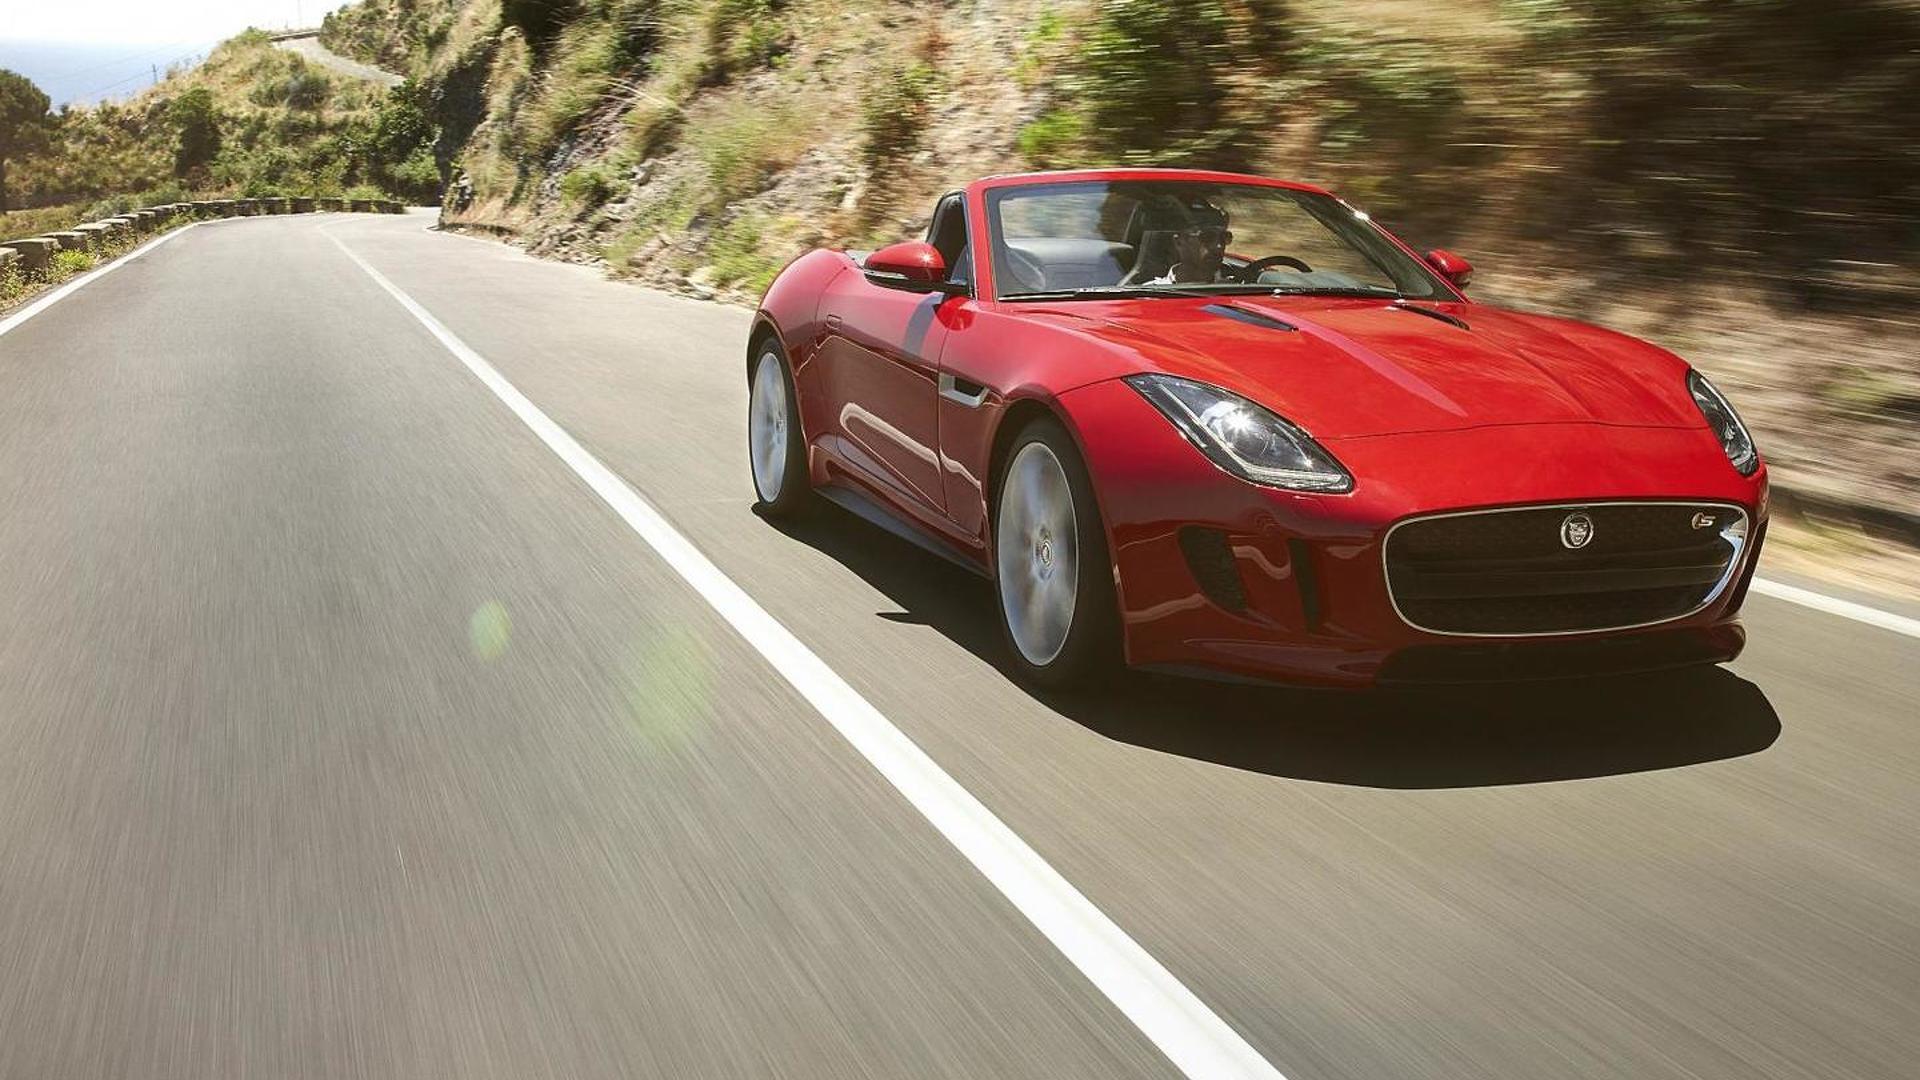 Jaguar F-Type concept to debut at Goodwood